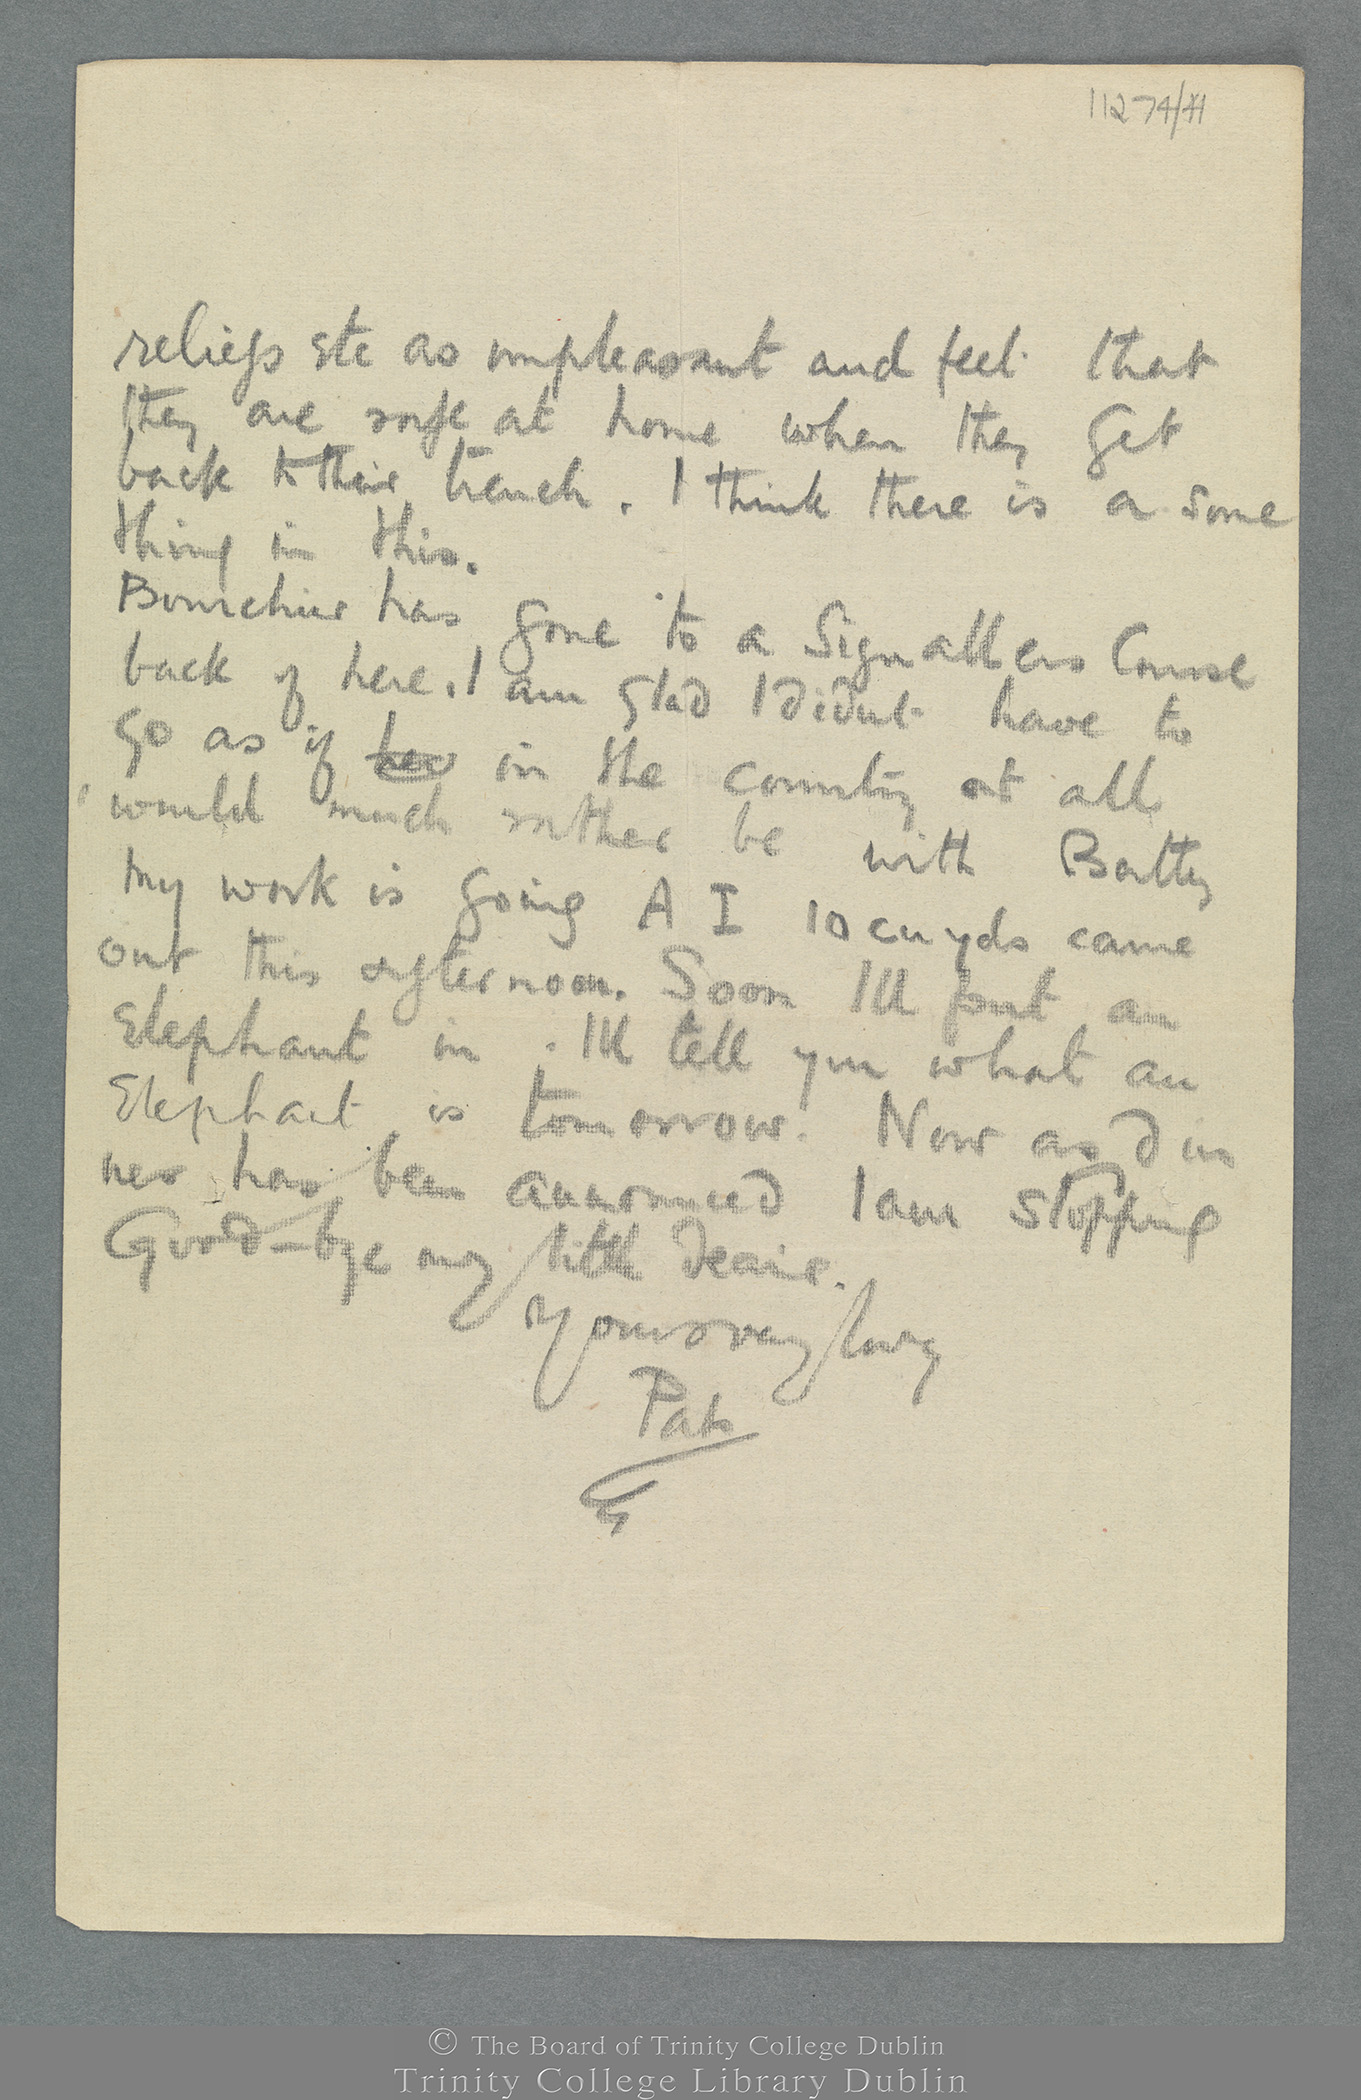 TCD MS 11274/41 folio 3 recto